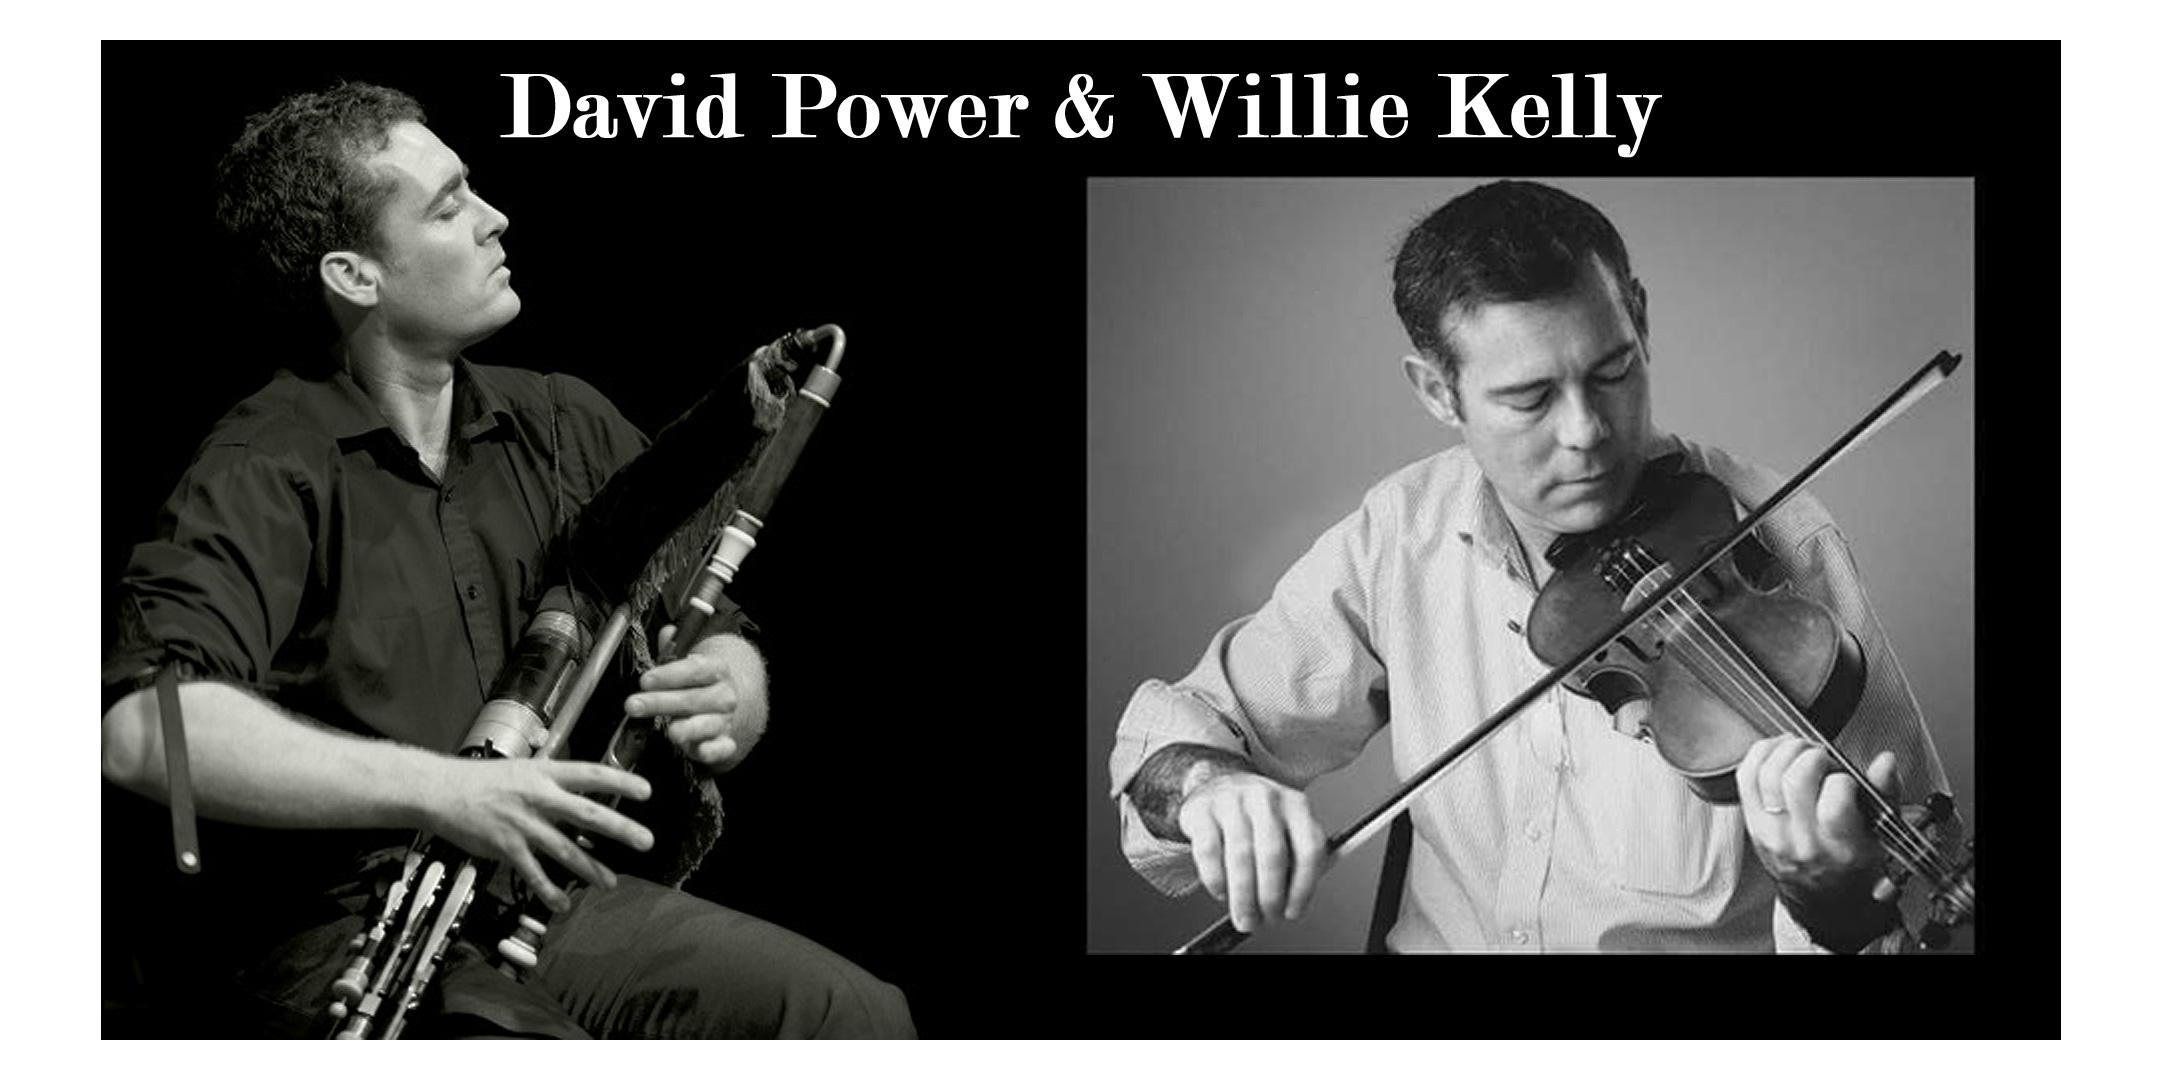 David Power & Willie Kelly